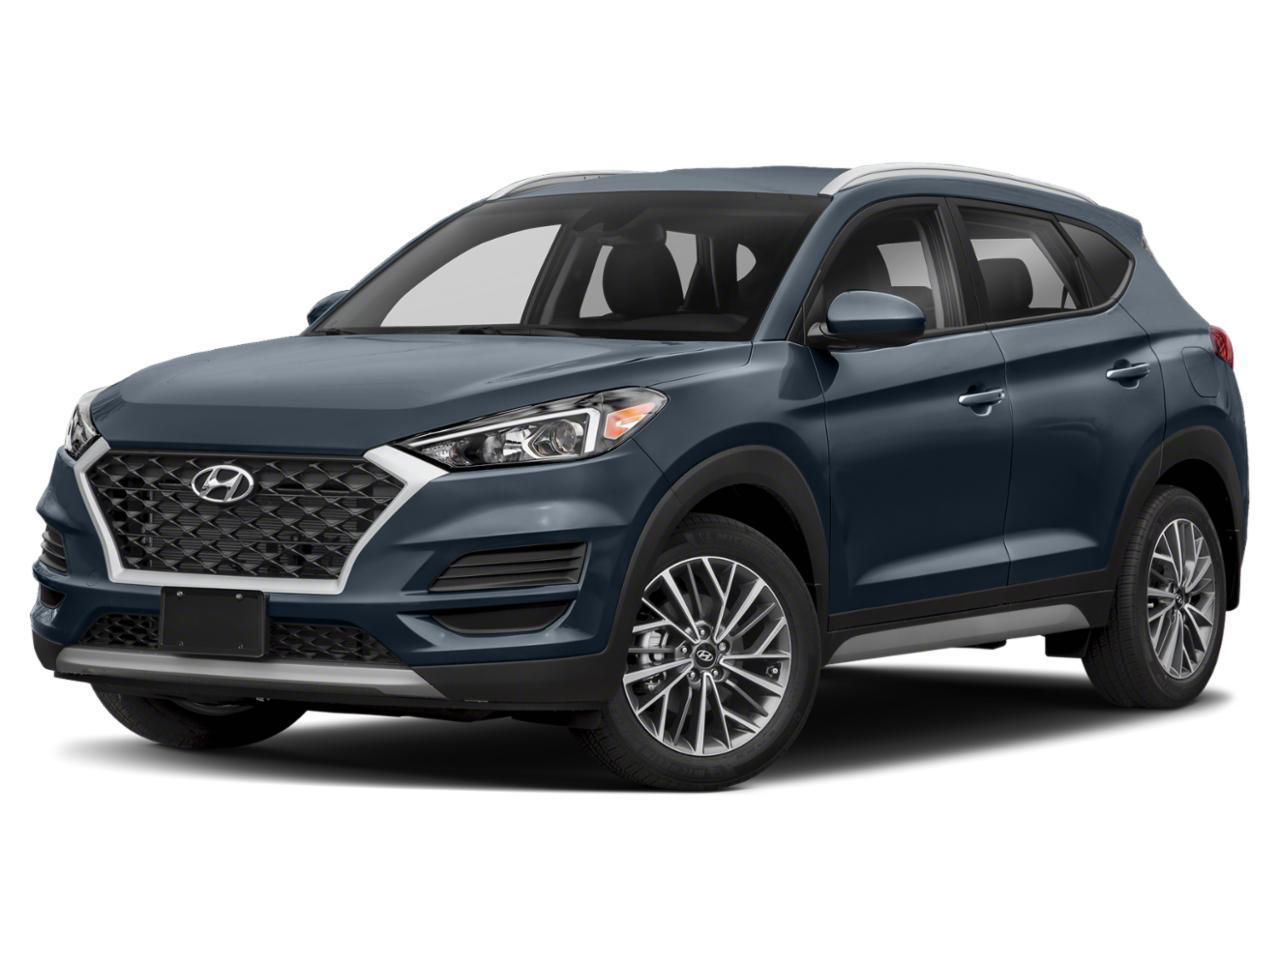 2019 Hyundai Tucson Vehicle Photo in MEDINA, OH 44256-9631